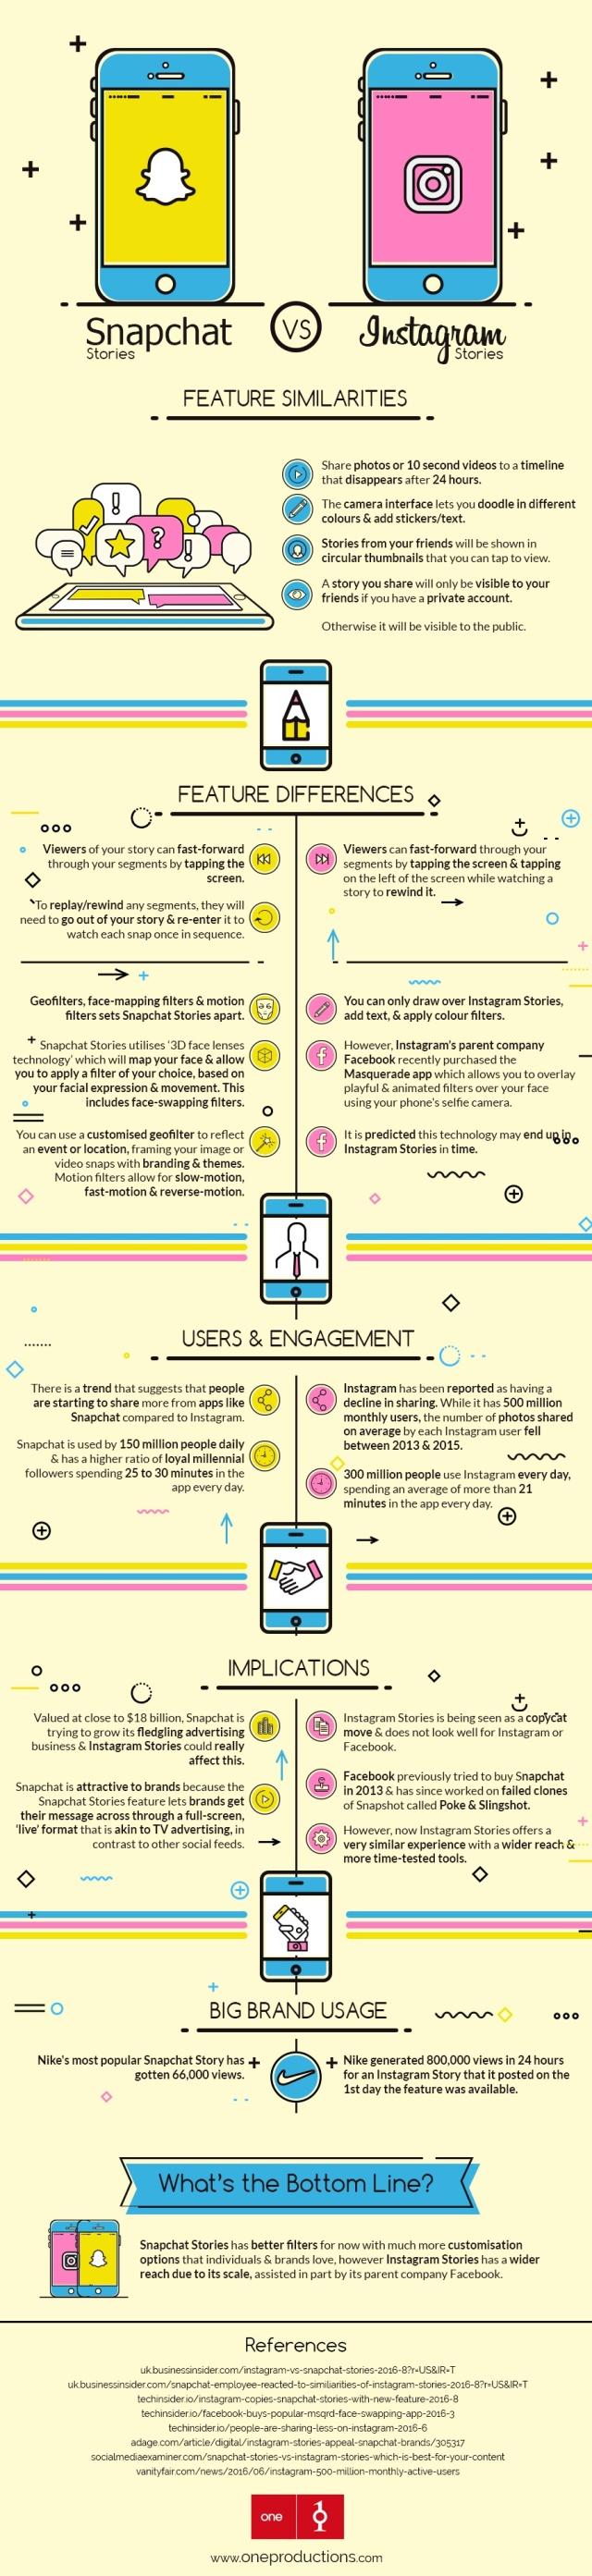 Snapchat-Stories-vs-Instagram-Stories-Influenth.jpg